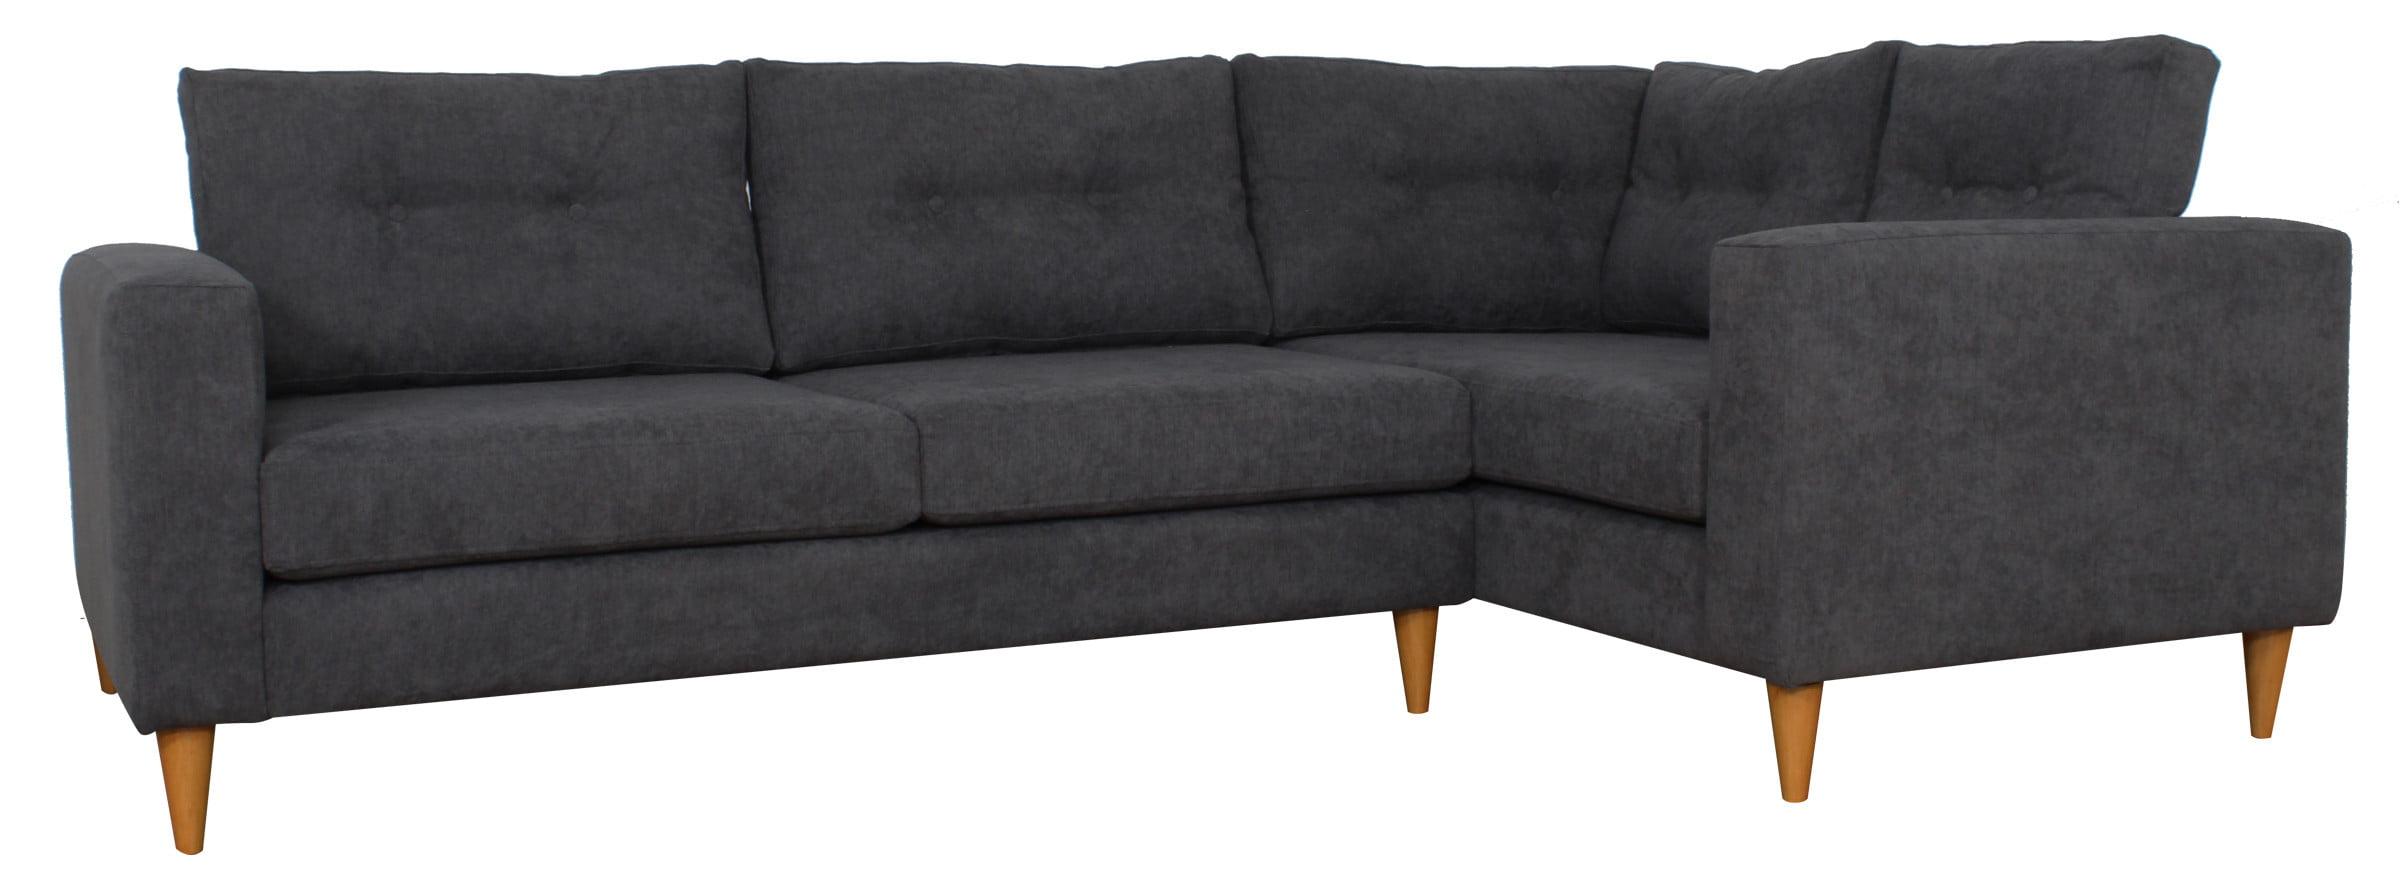 Sofa Modular Mecha Personalizado 22